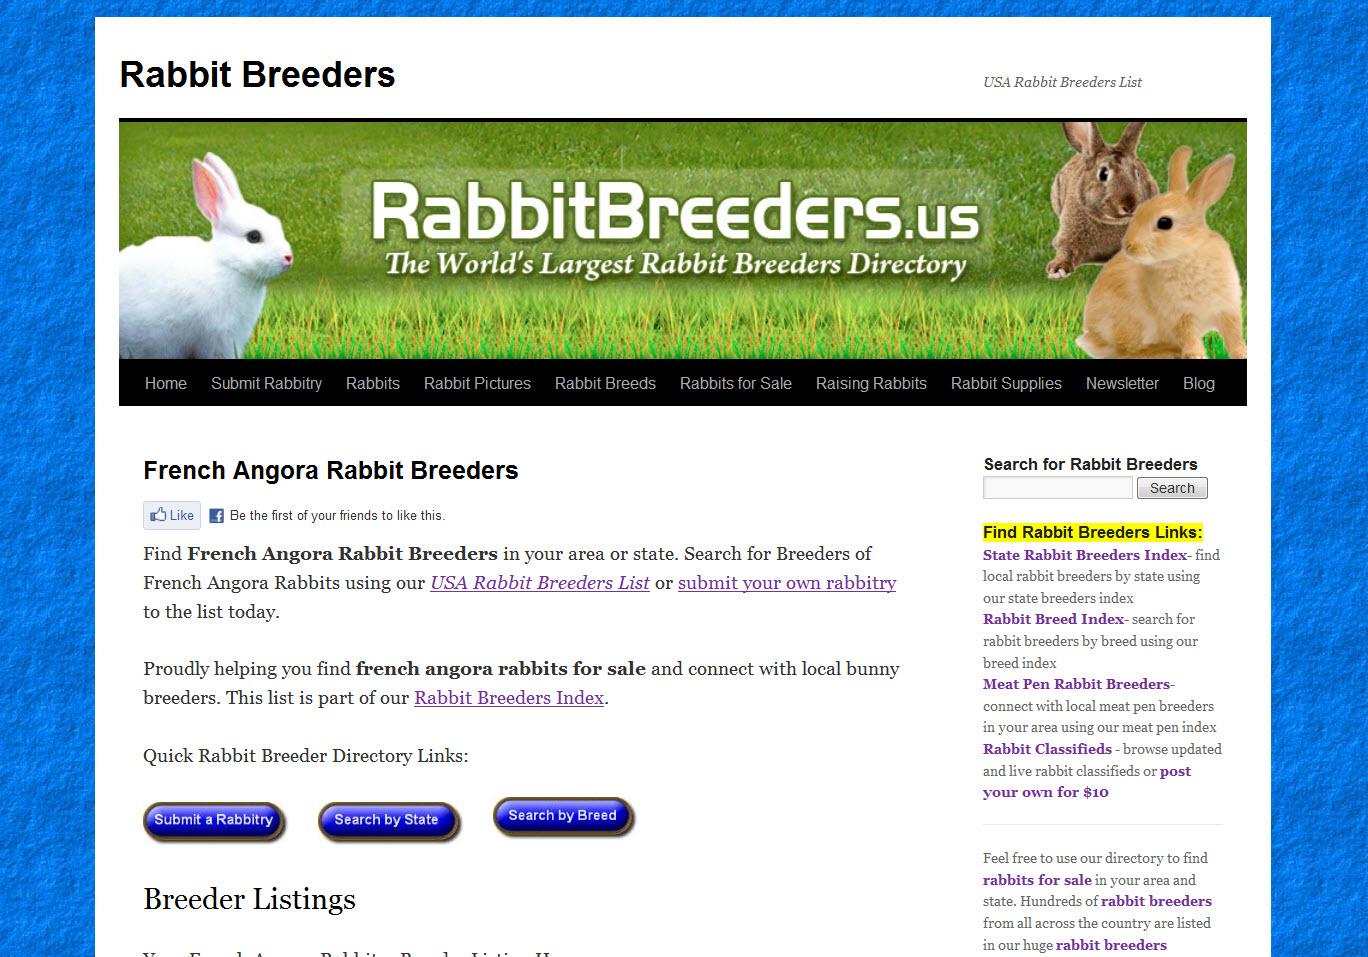 French Angora Rabbit Breeders